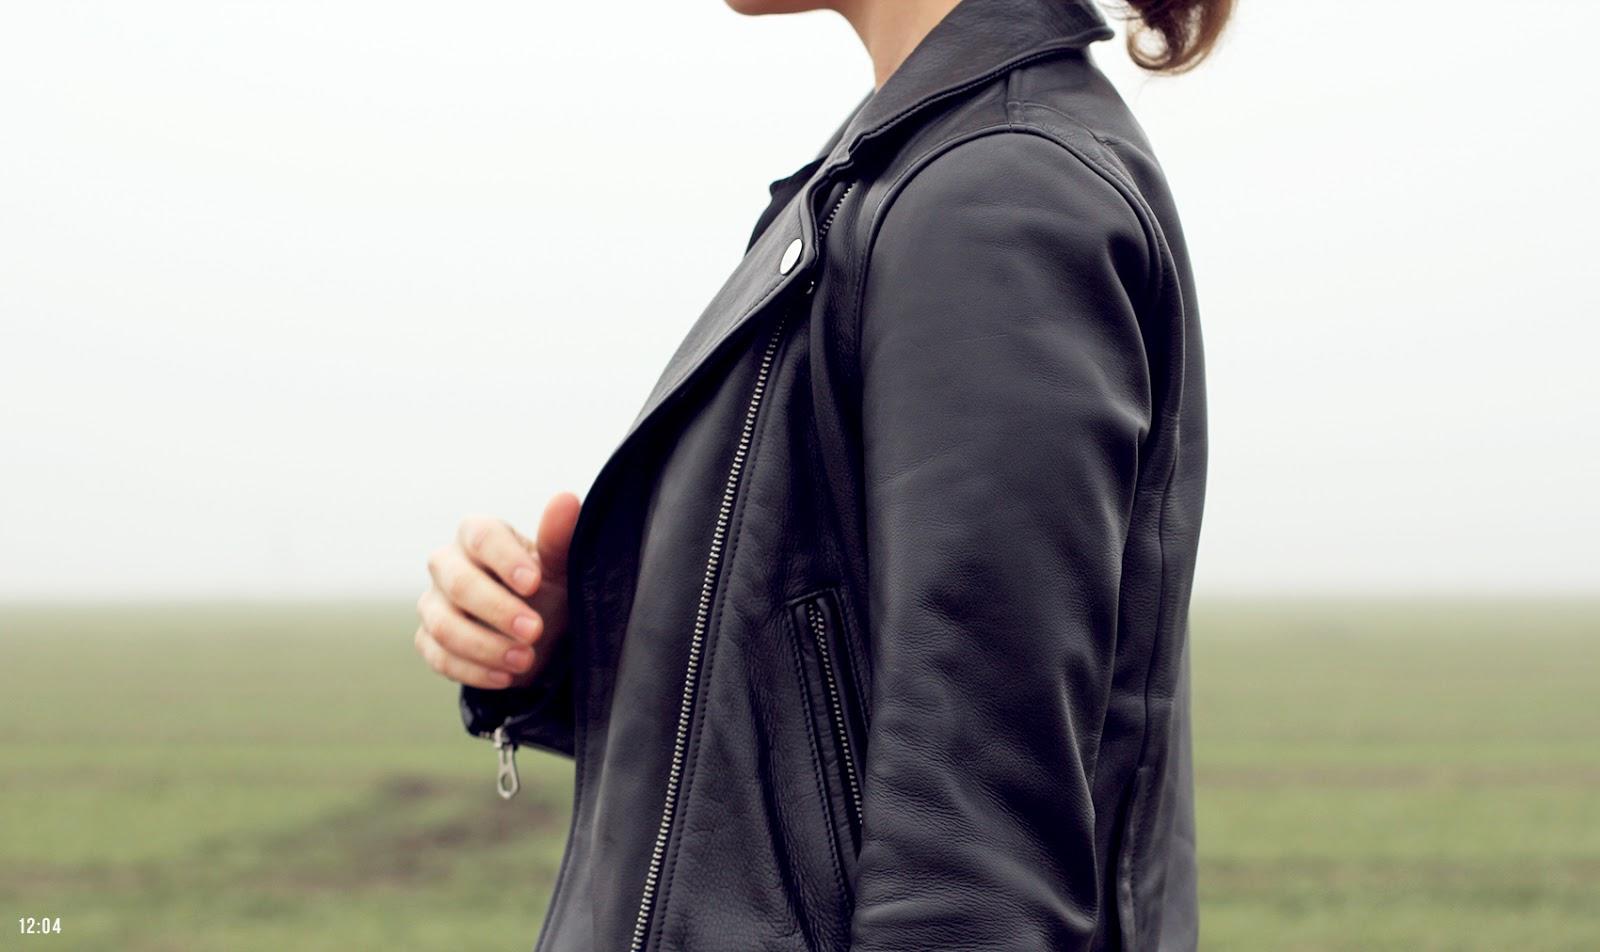 506-twelveofour-dixon-fog-all-black-yang-li-everlane-IMG_5735.jpg